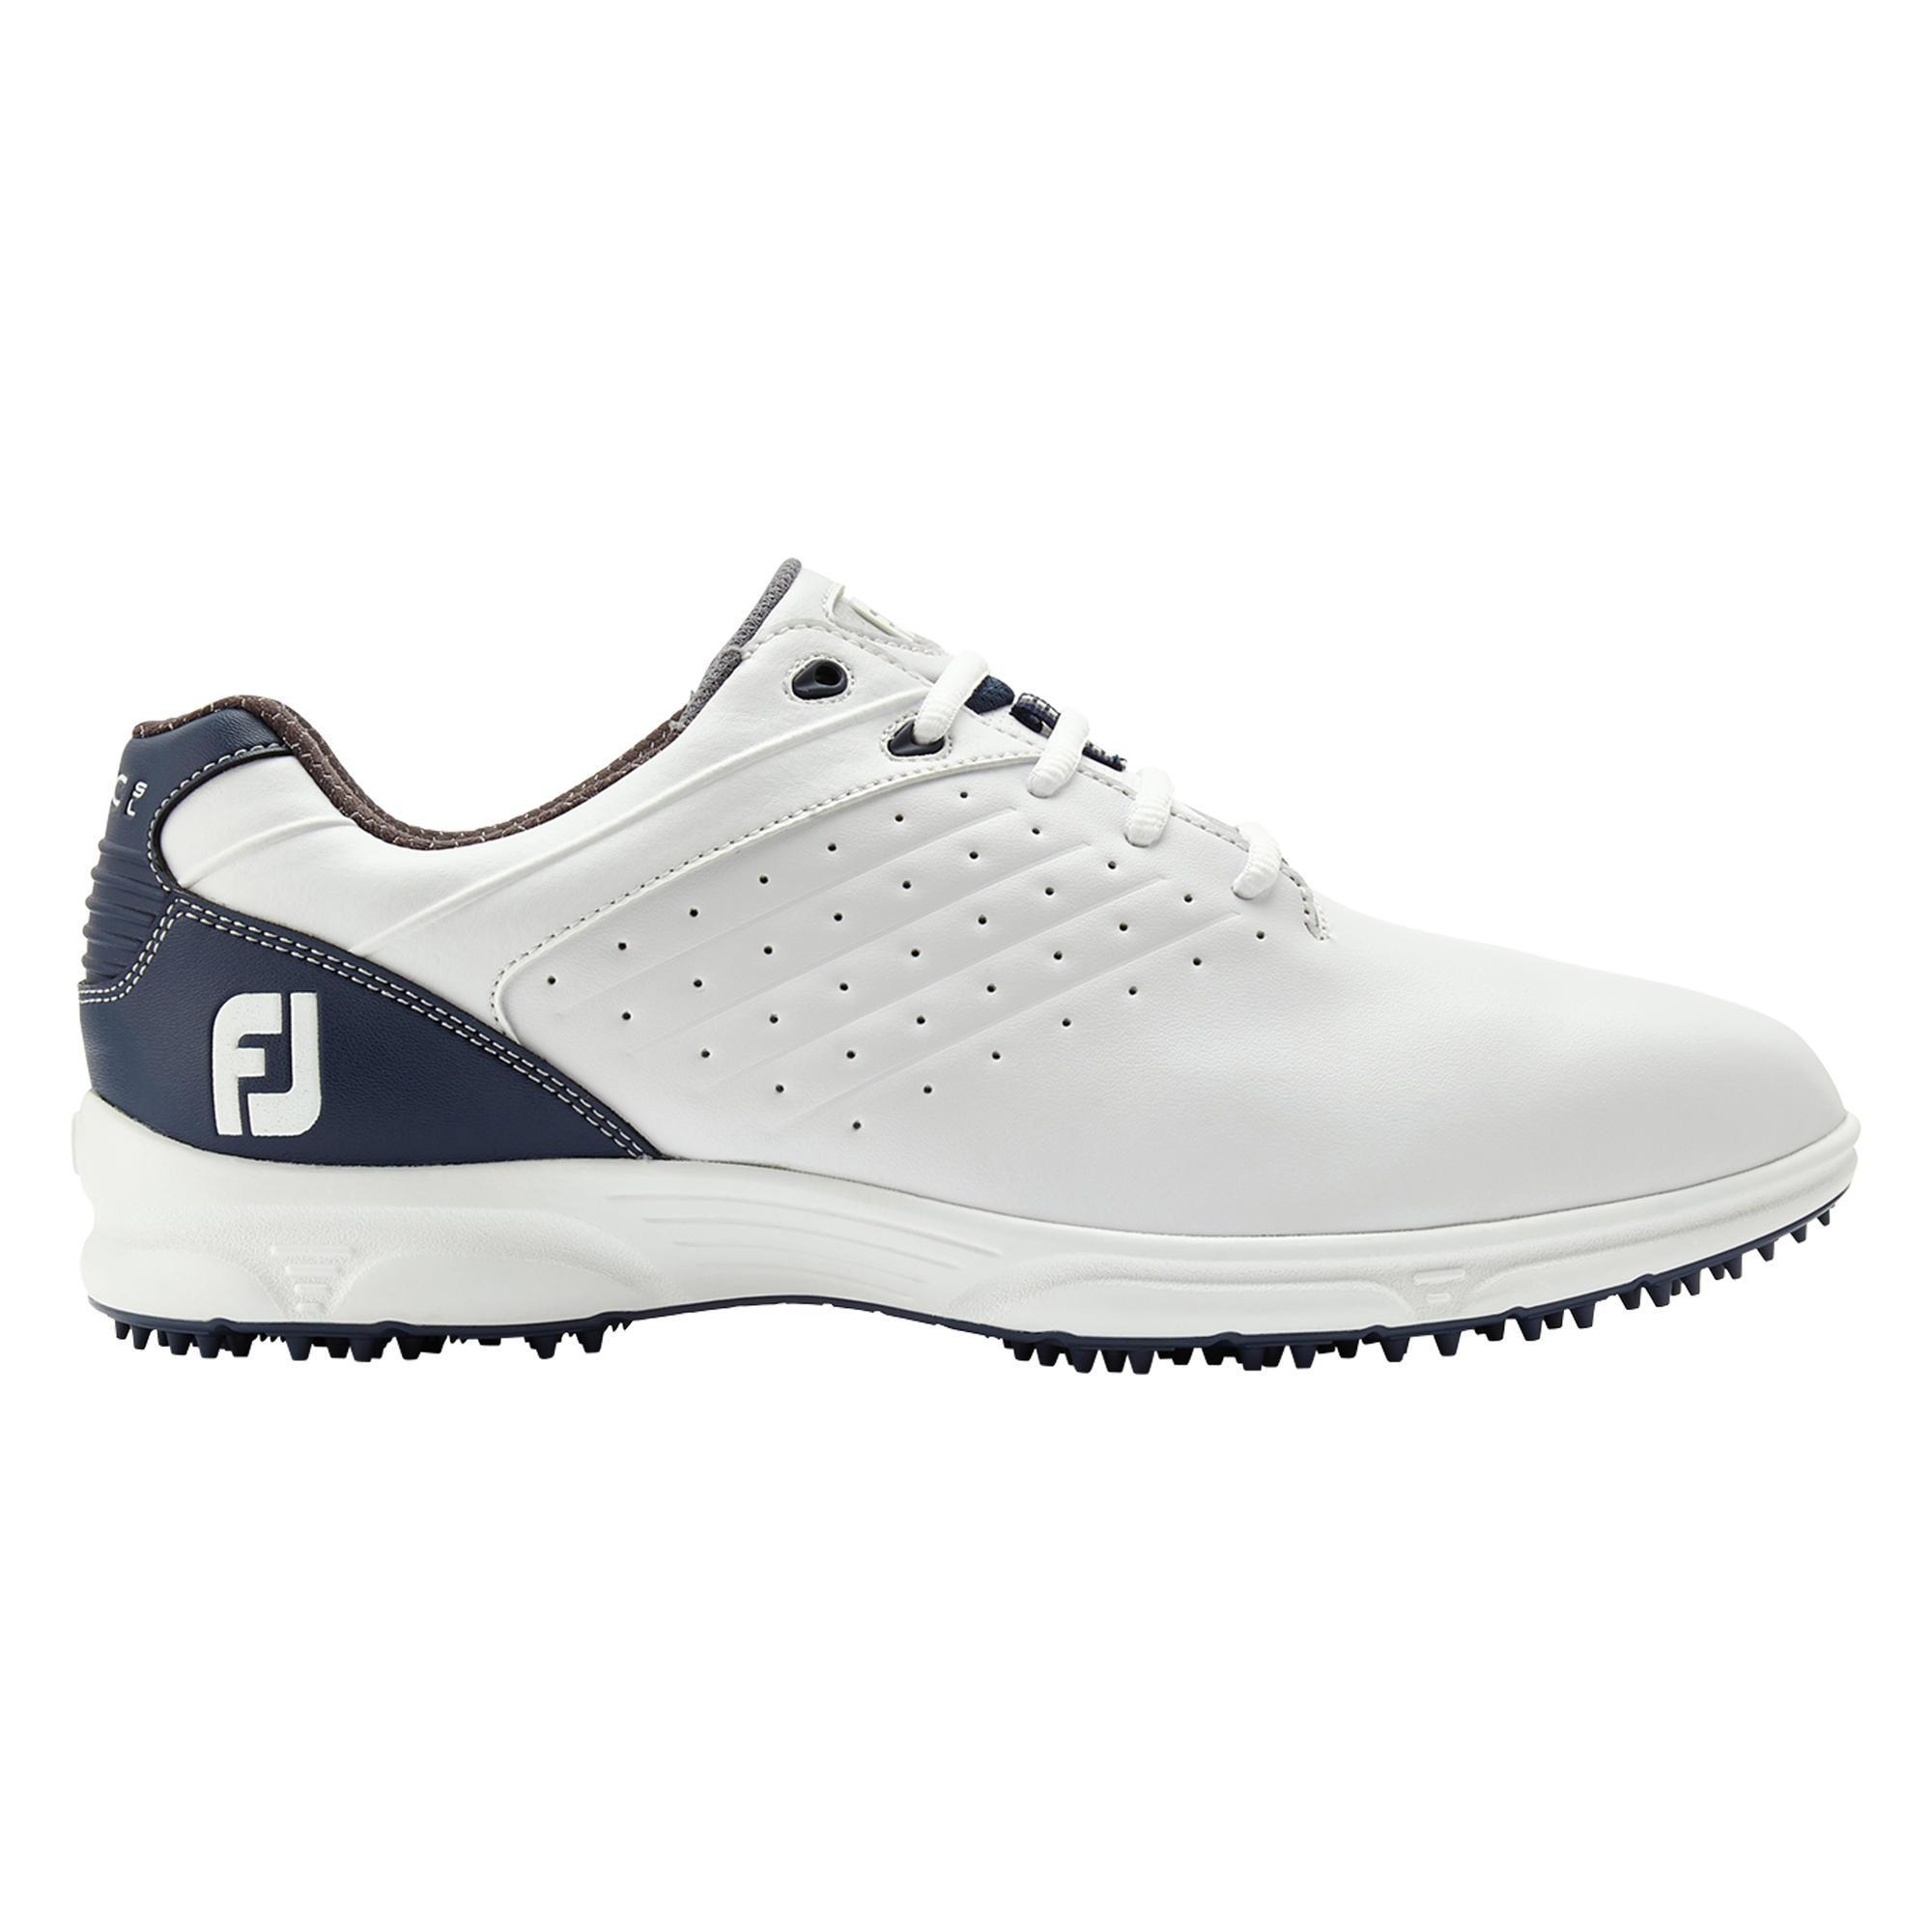 Chaussures golf homme arc sl blanchesmarines footjoy